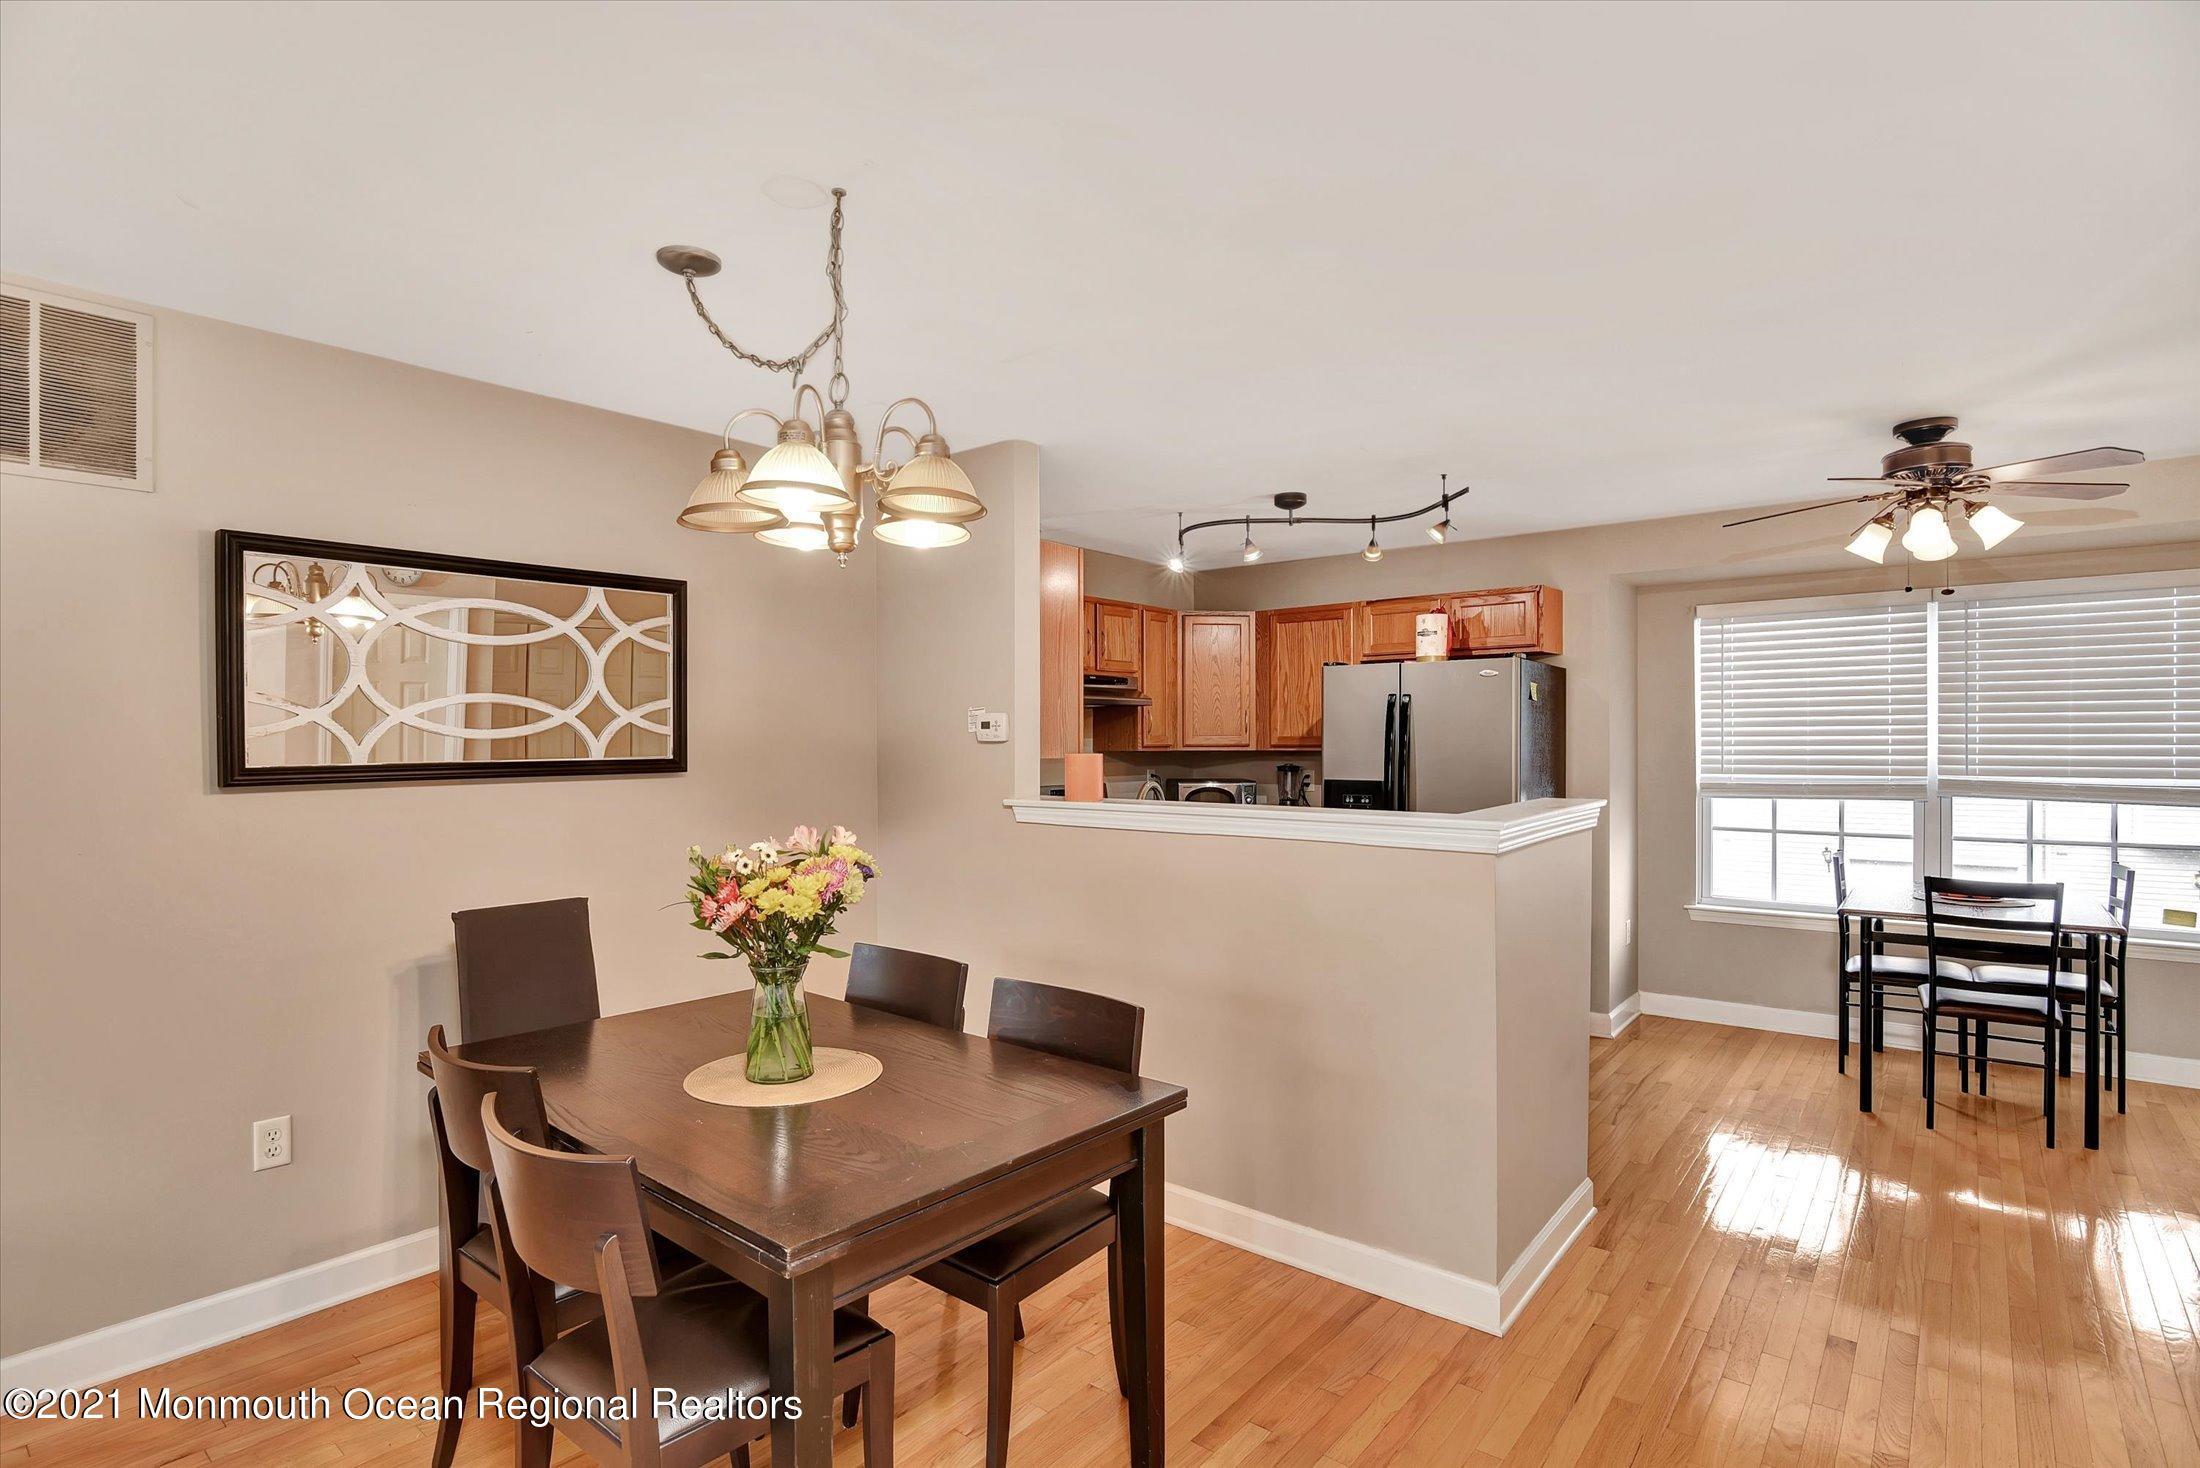 14-Living & Dining Room